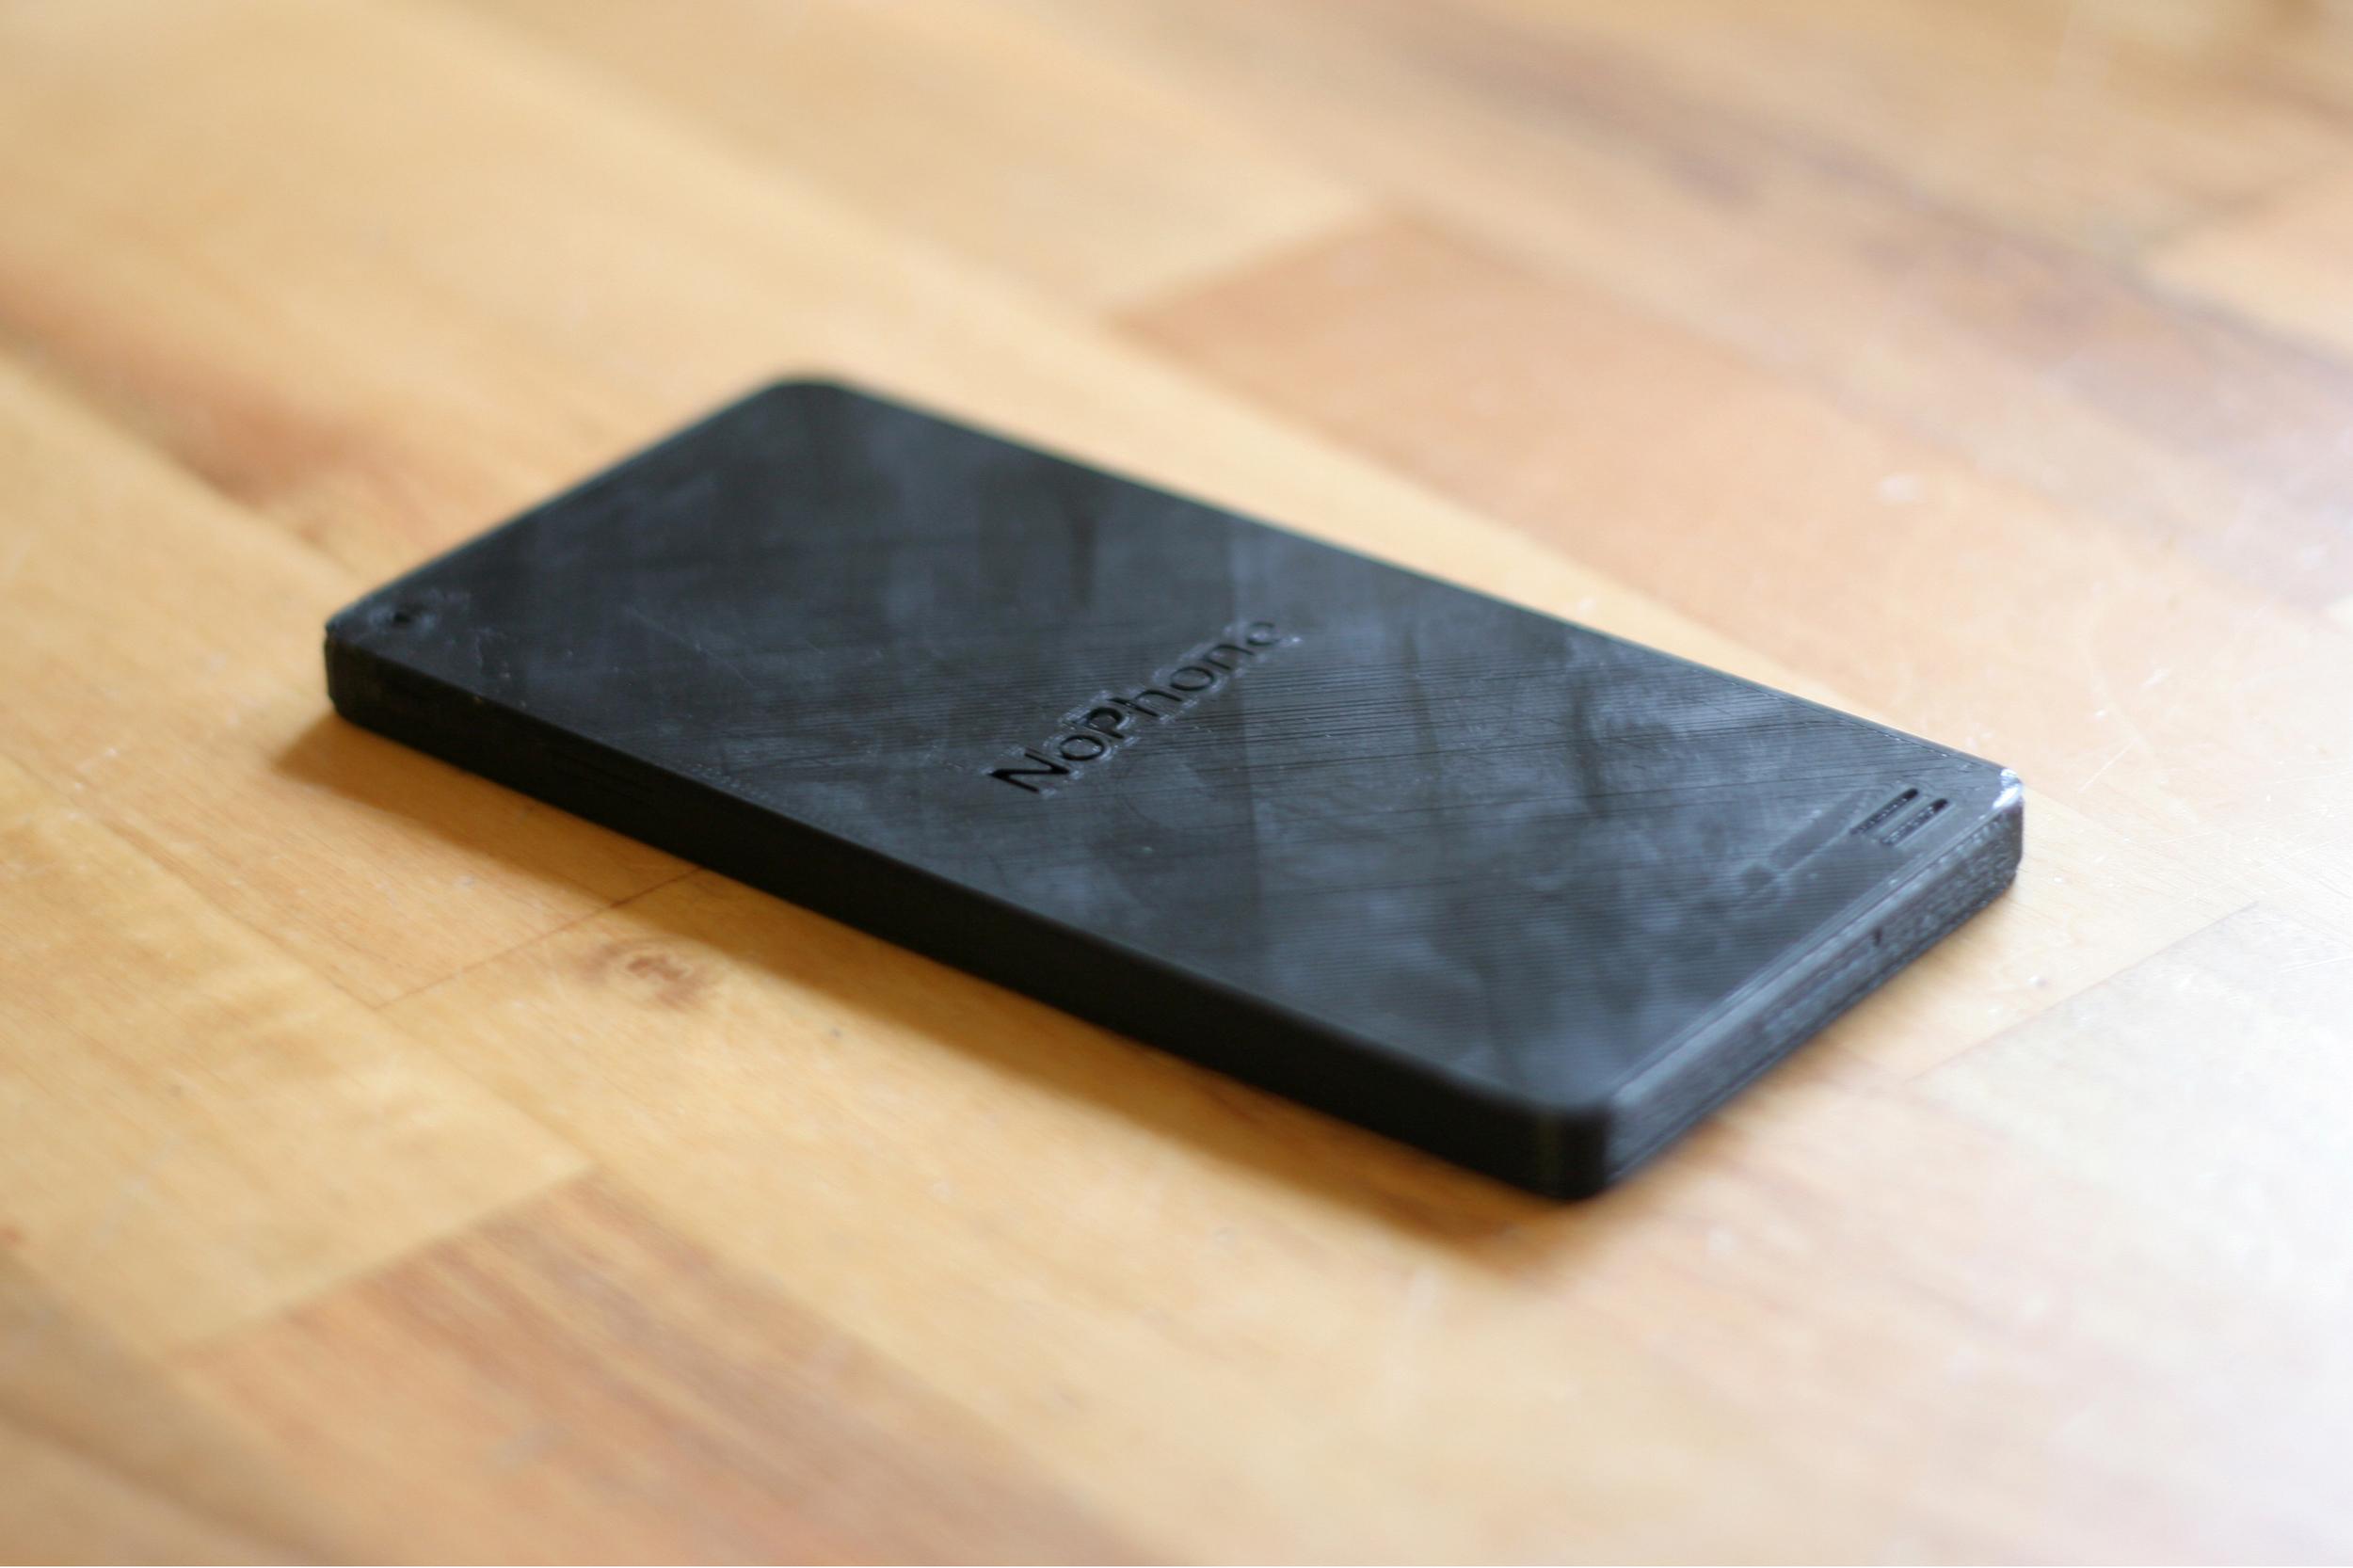 3D printed noPhone